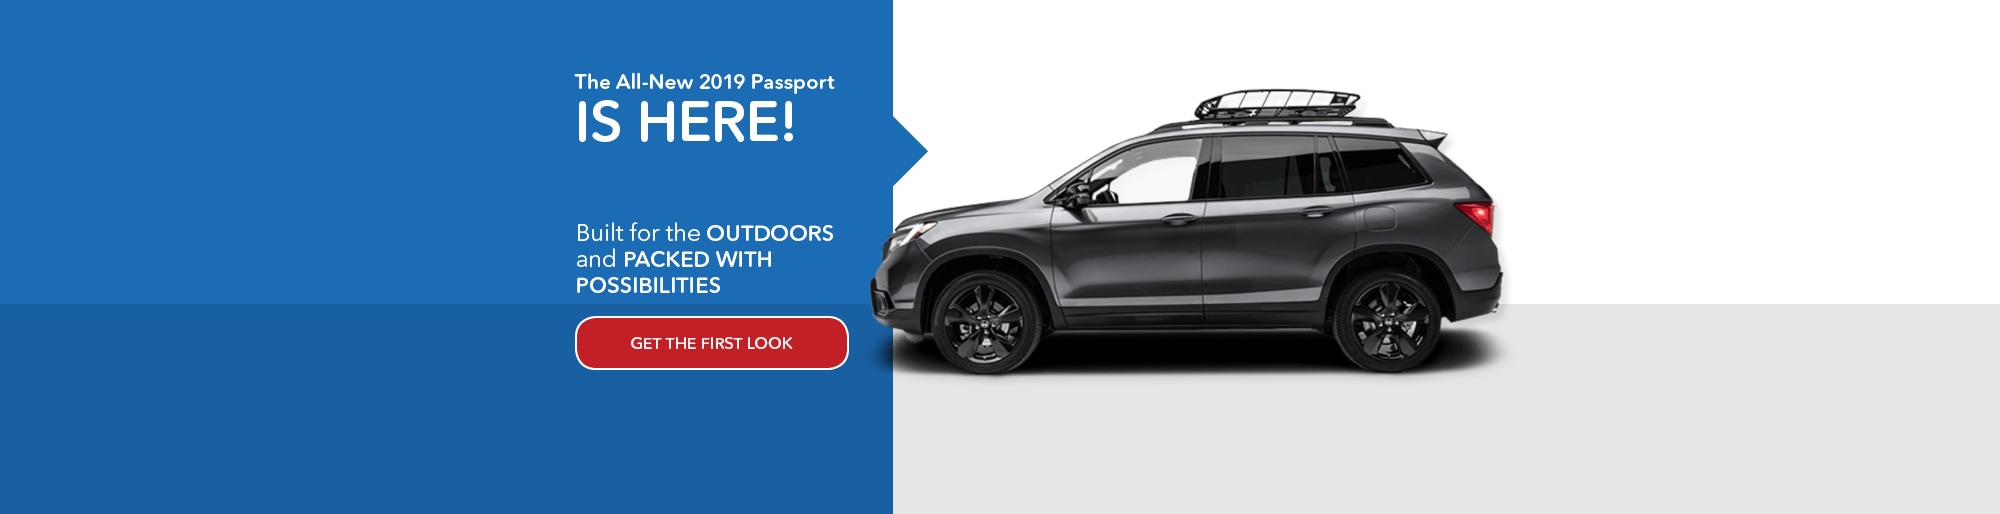 Honda Cars Of Concord >> New 2019 Used Honda Dealership In Concord Nc Near Charlotte